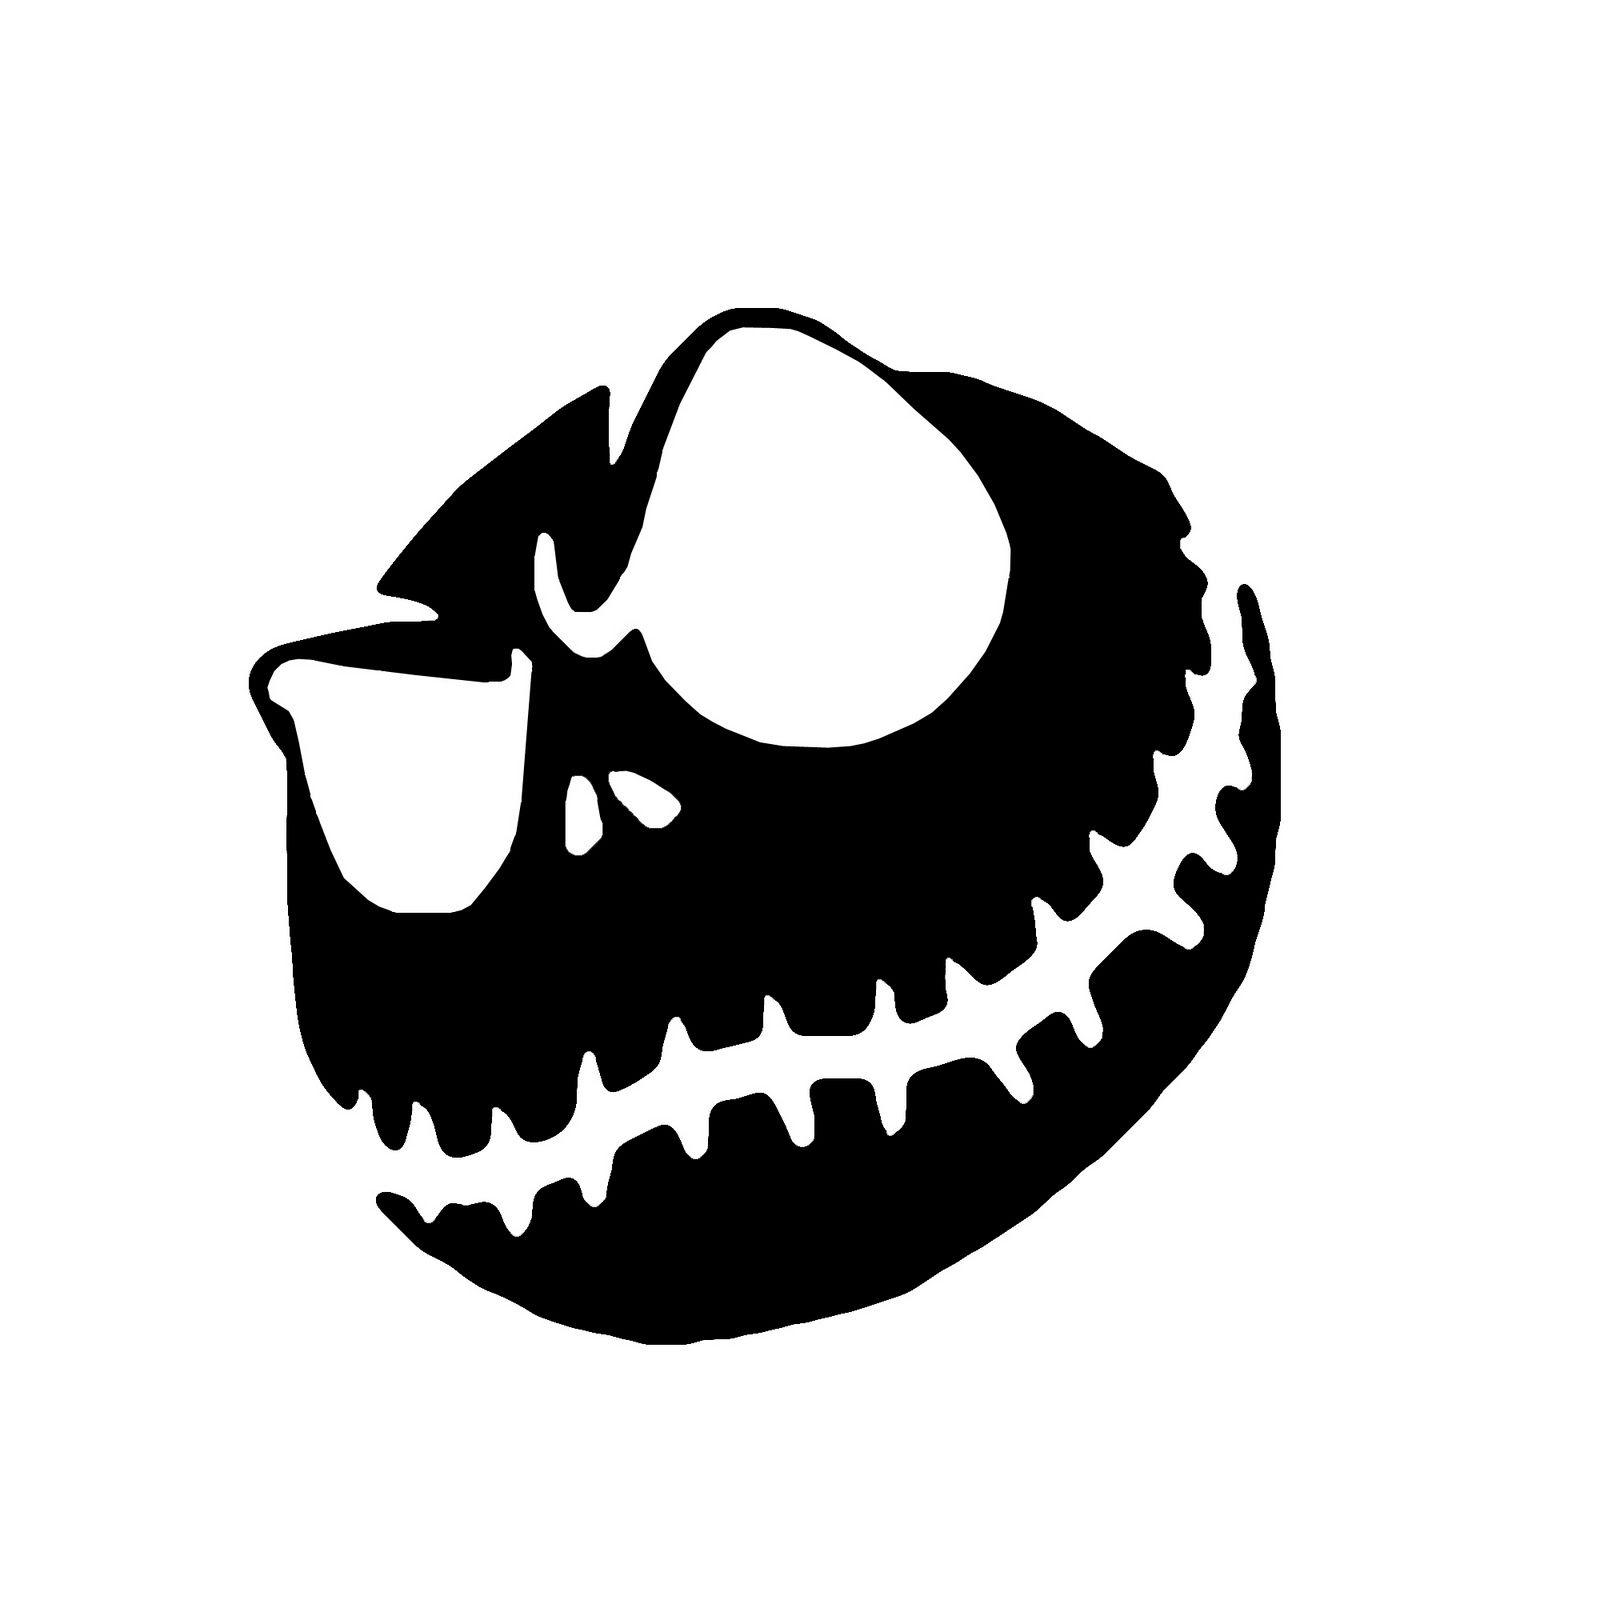 simple stencil - Google Search | Stencil | Pinterest | Halloween ...